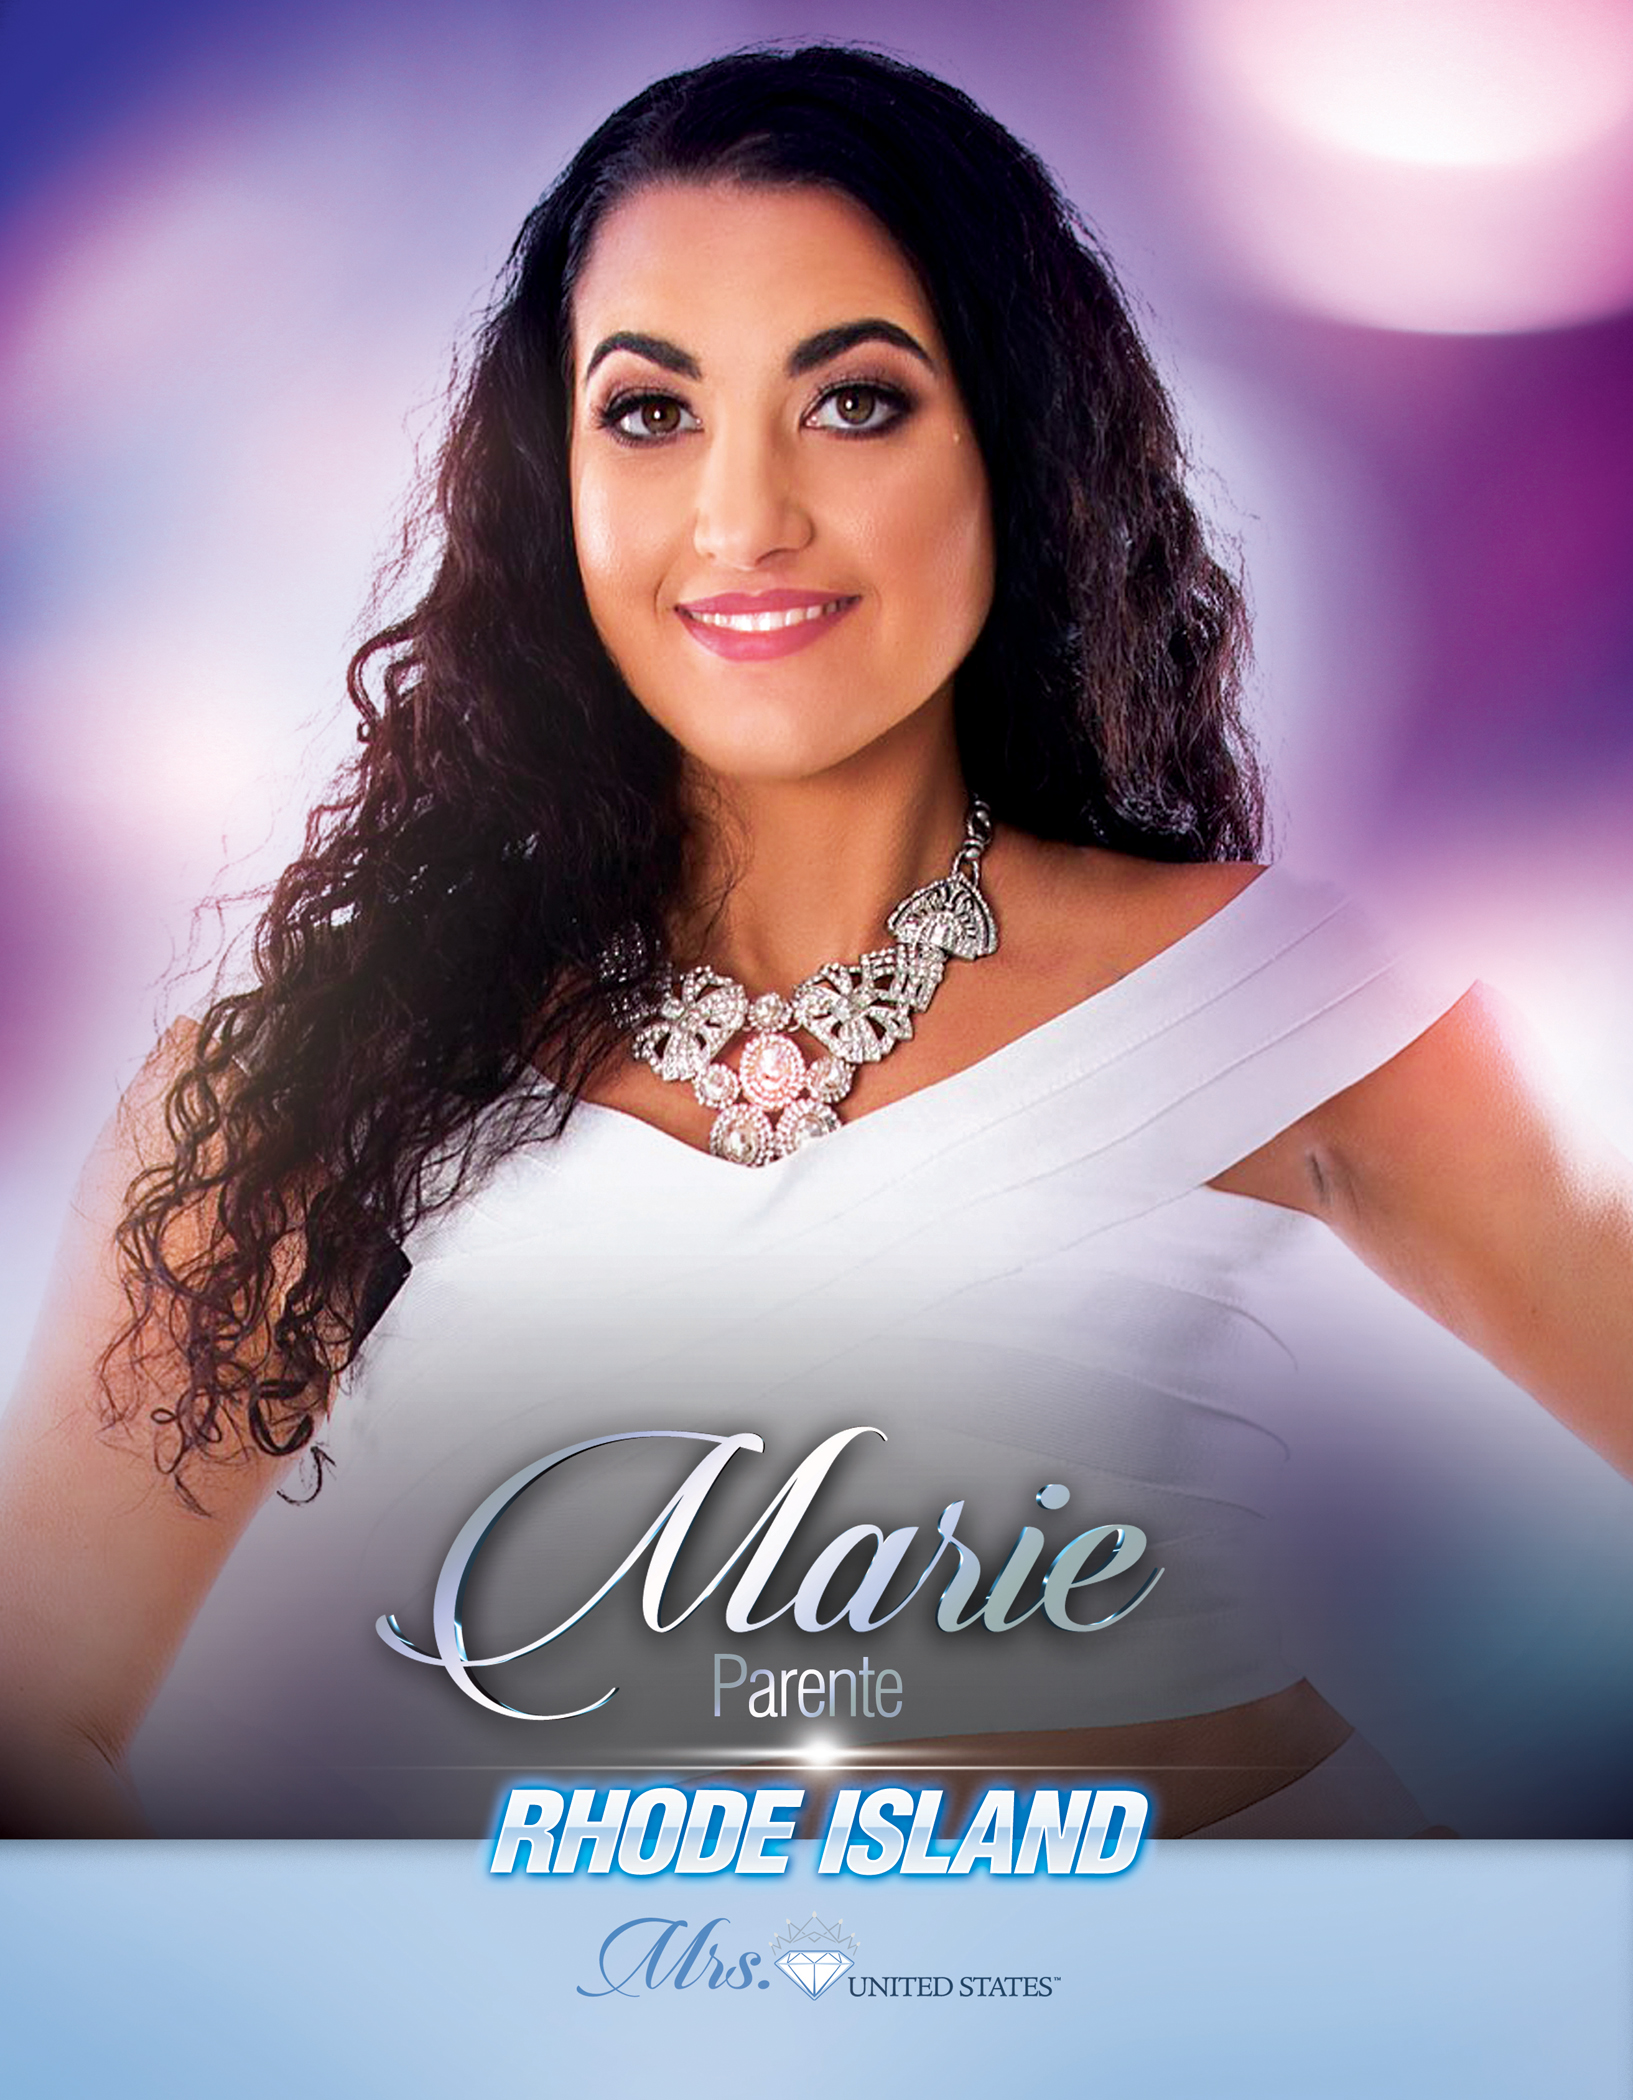 Marie Parente Mrs. Rhode Island United States - 2019